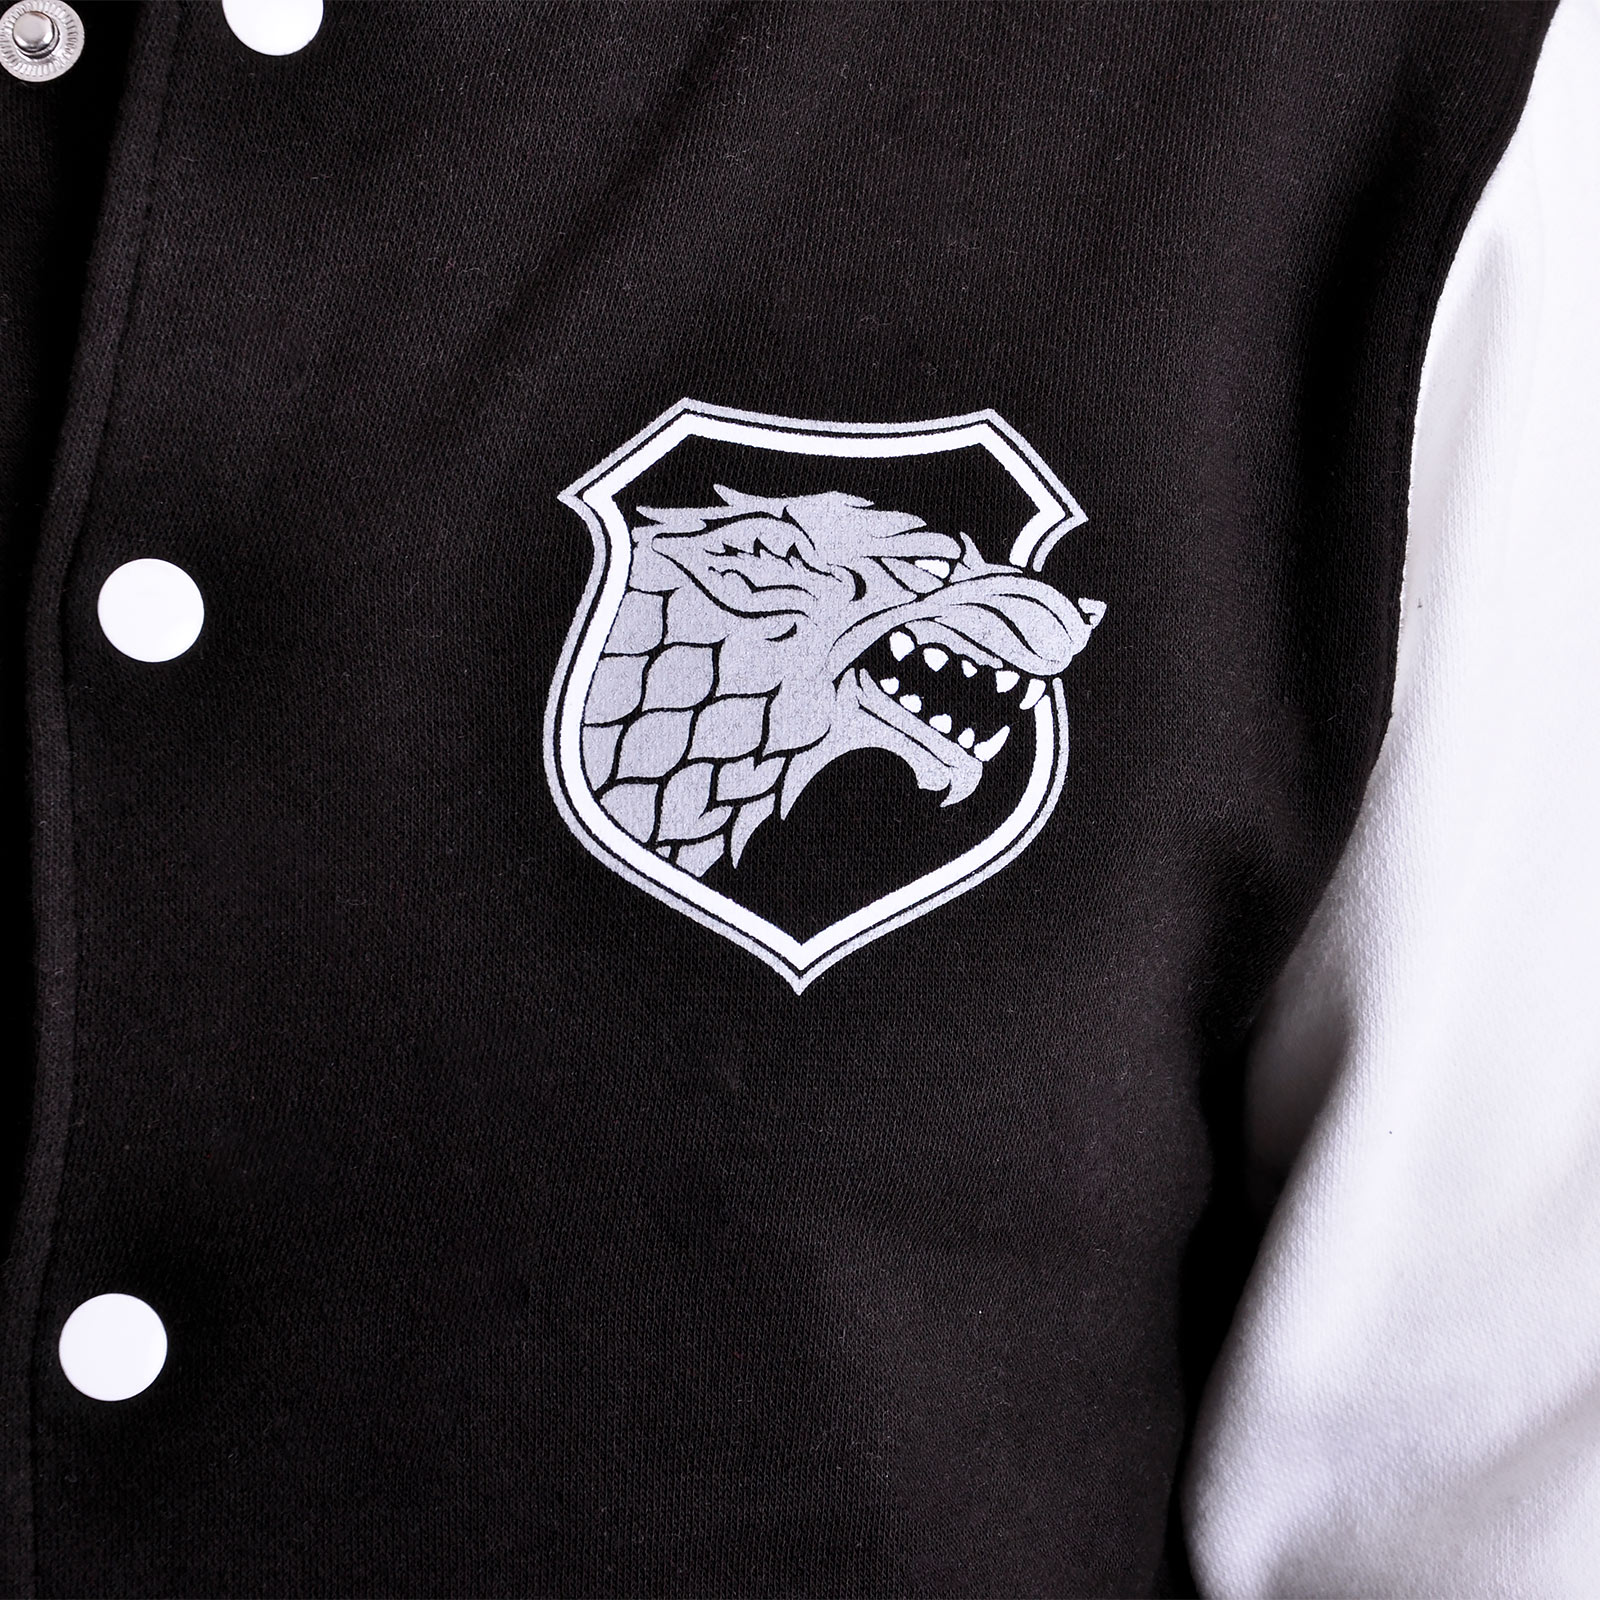 Game of Thrones - Stark College Jacke